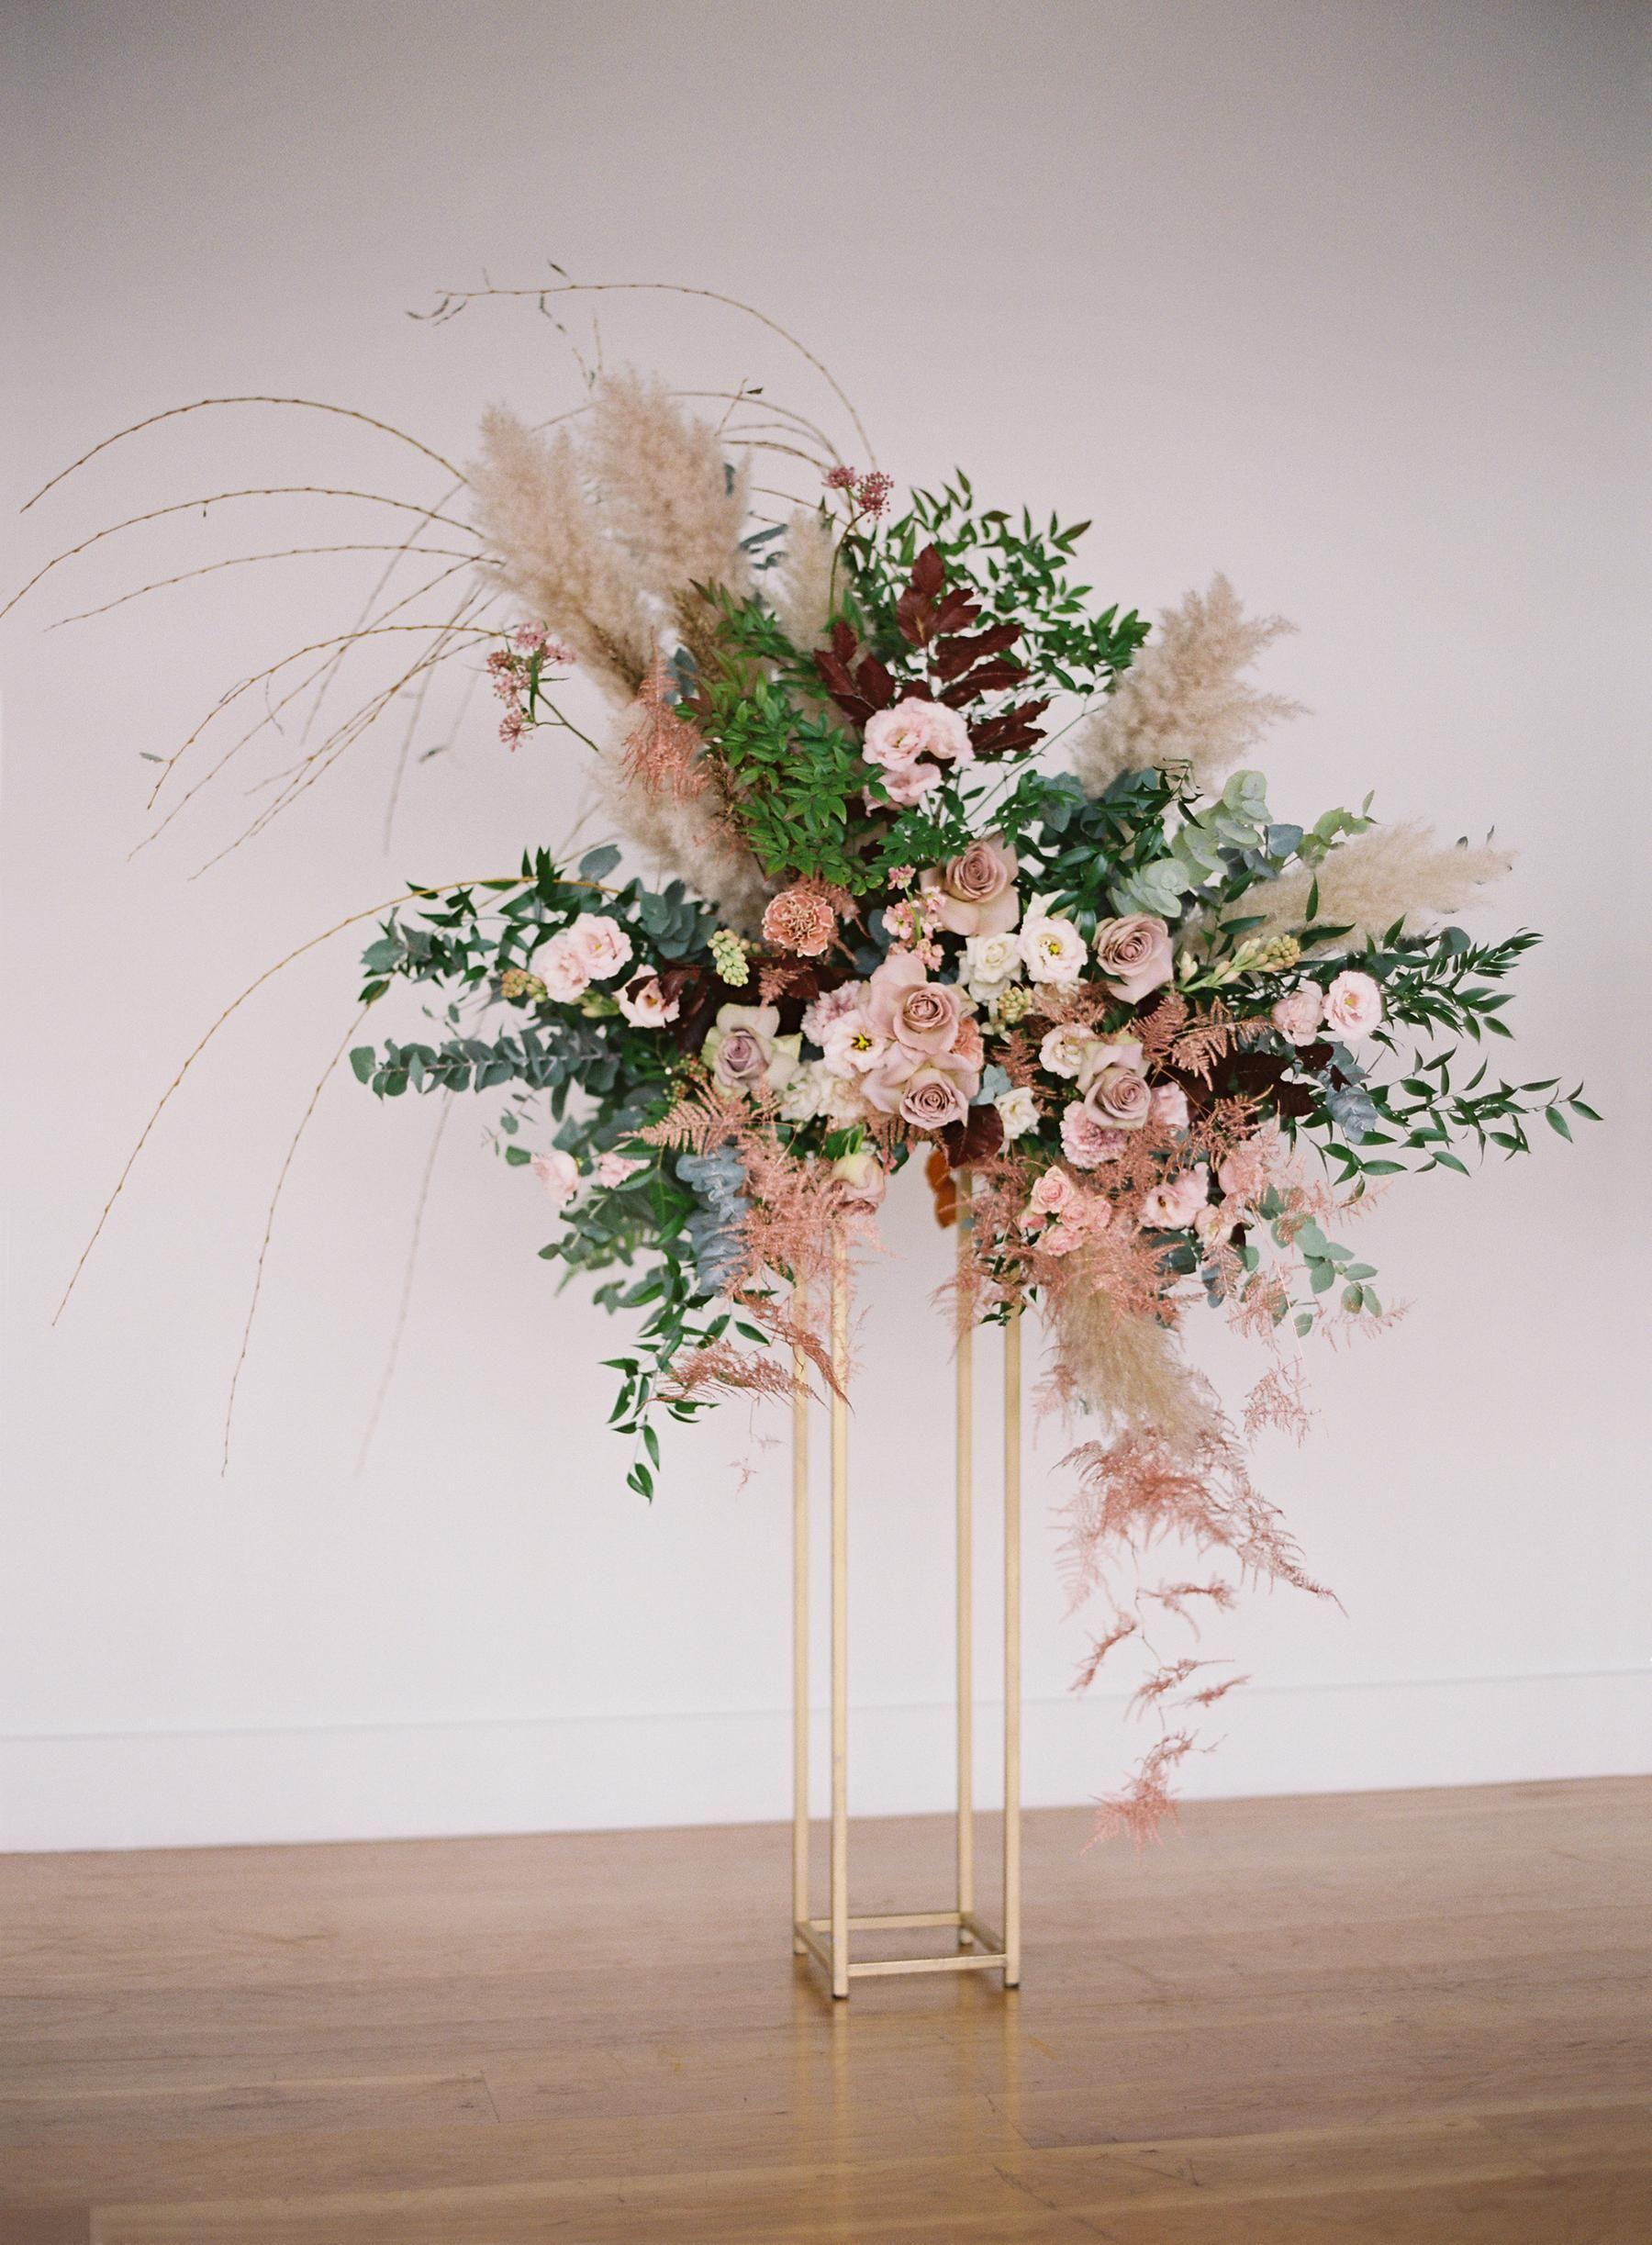 Industrial Romantic Nyc Wedding Inspiration Shoot At Boro Hotel In Long Island City Wedding Flower Design Tall Flower Arrangements Floral Arrangements Wedding